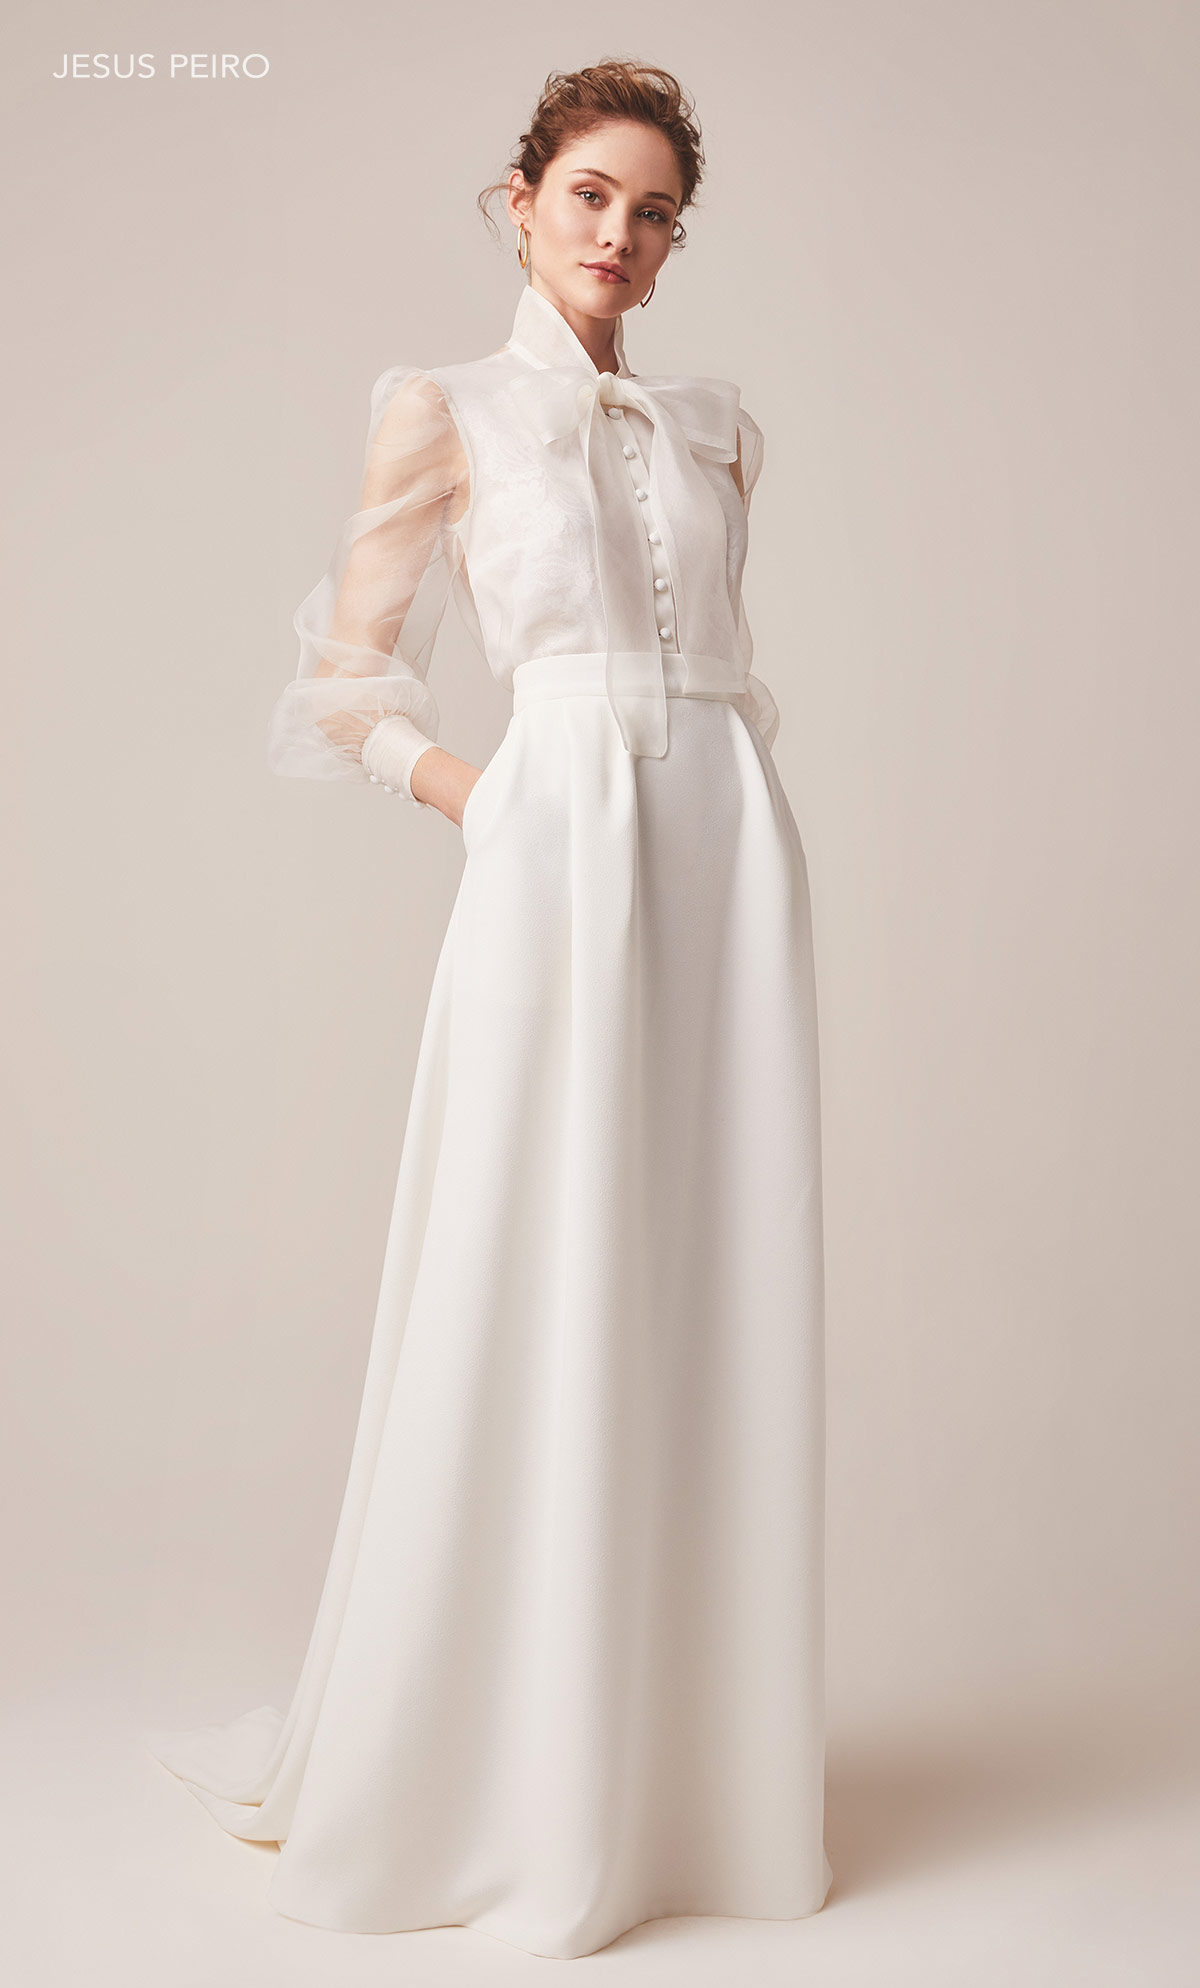 Vestido novia Jesús Peiró Ref.155